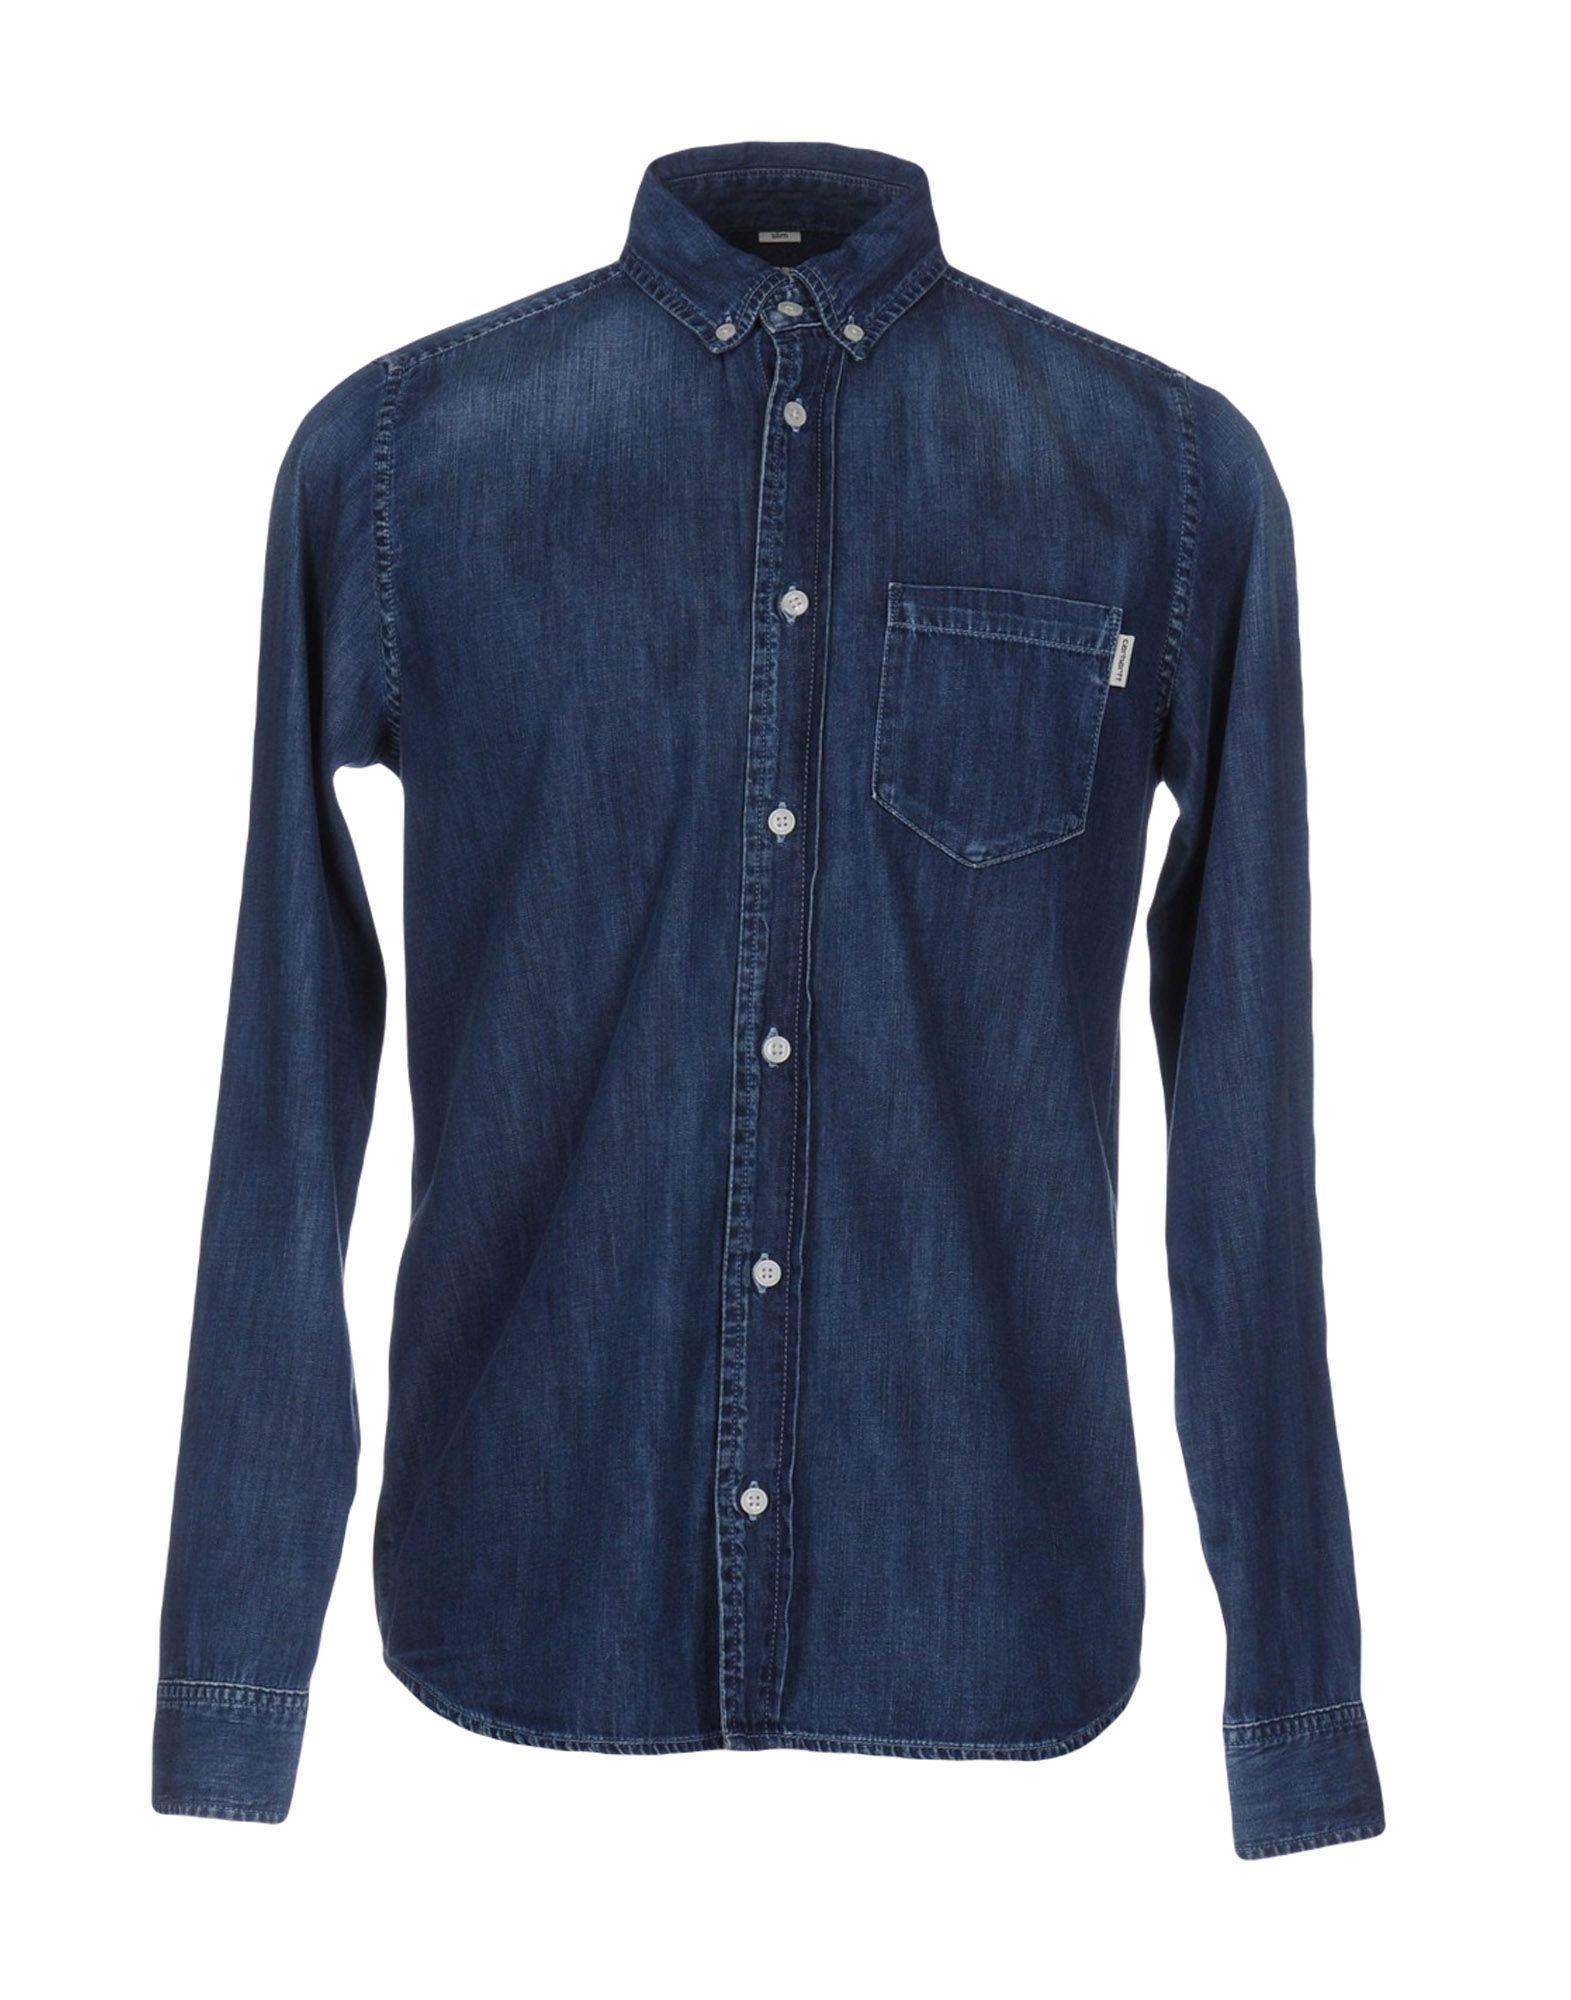 Carhartt Denim Shirts In Blue